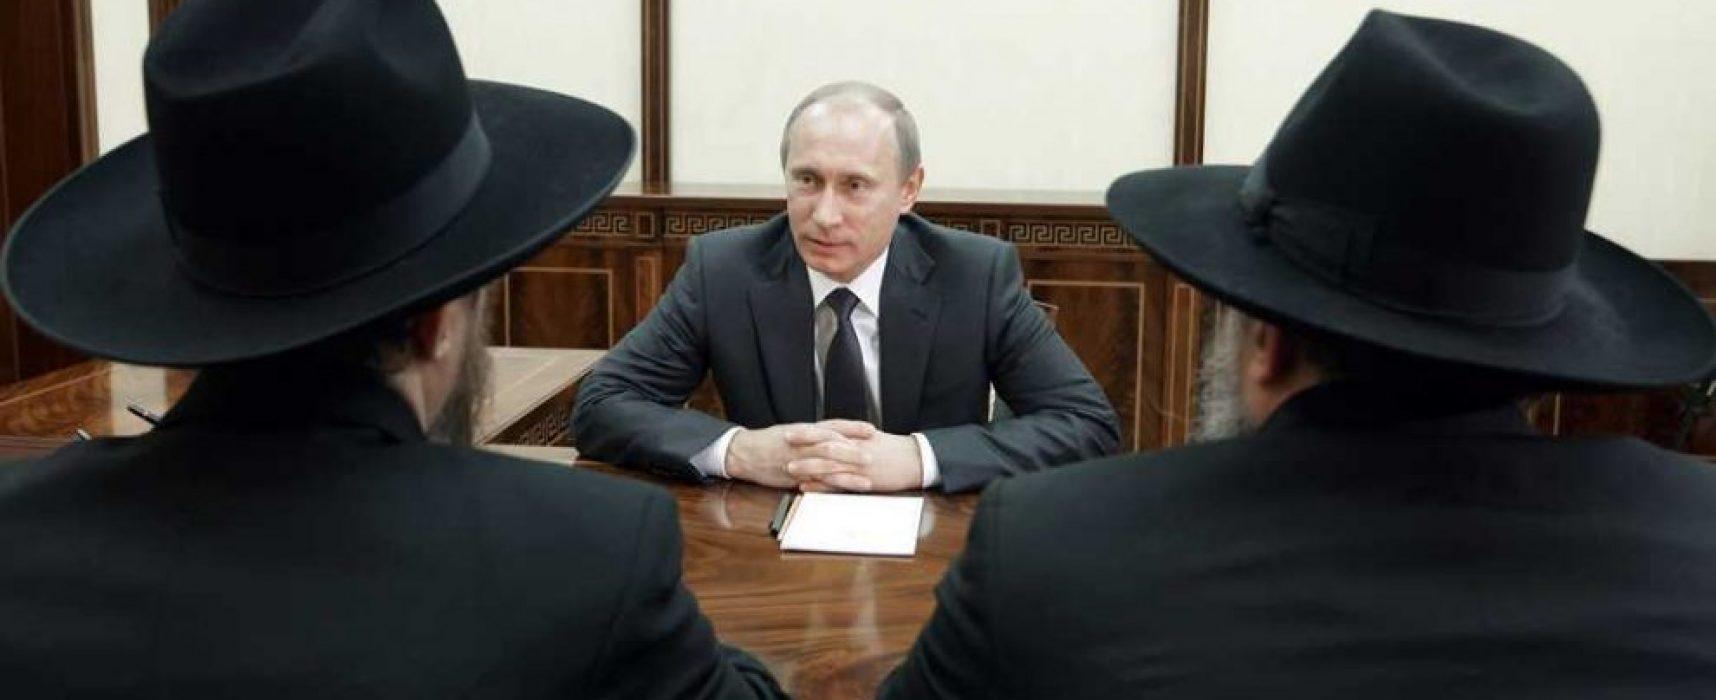 Putin has two reasons for playing 'the Jewish card,' Yakovenko says